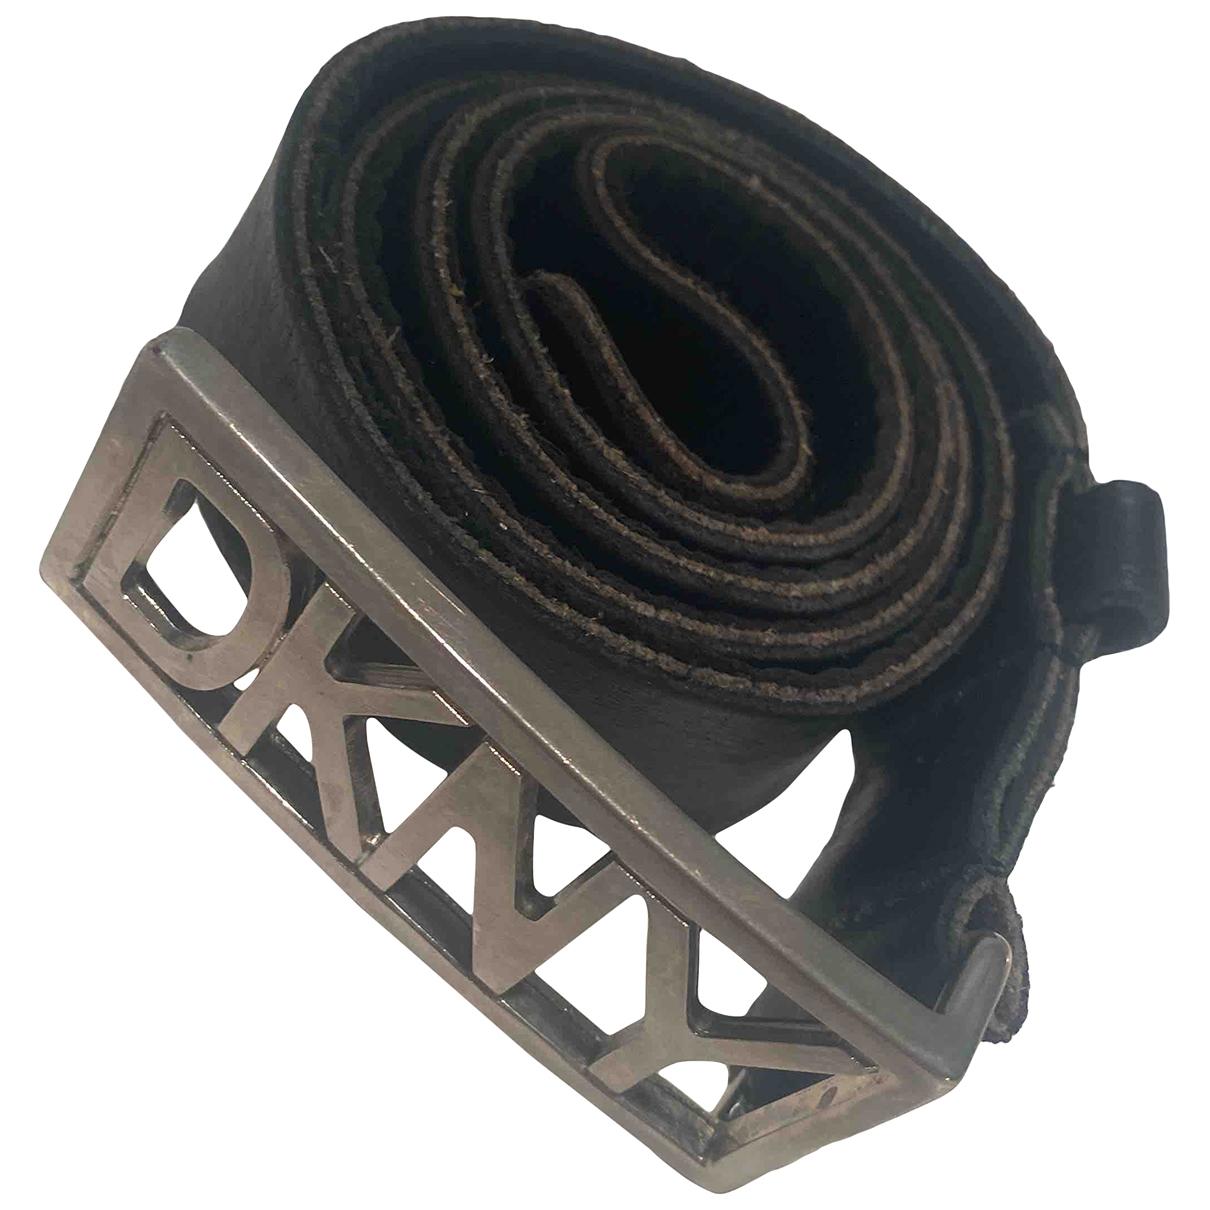 Dkny \N Black Leather belt for Women S International